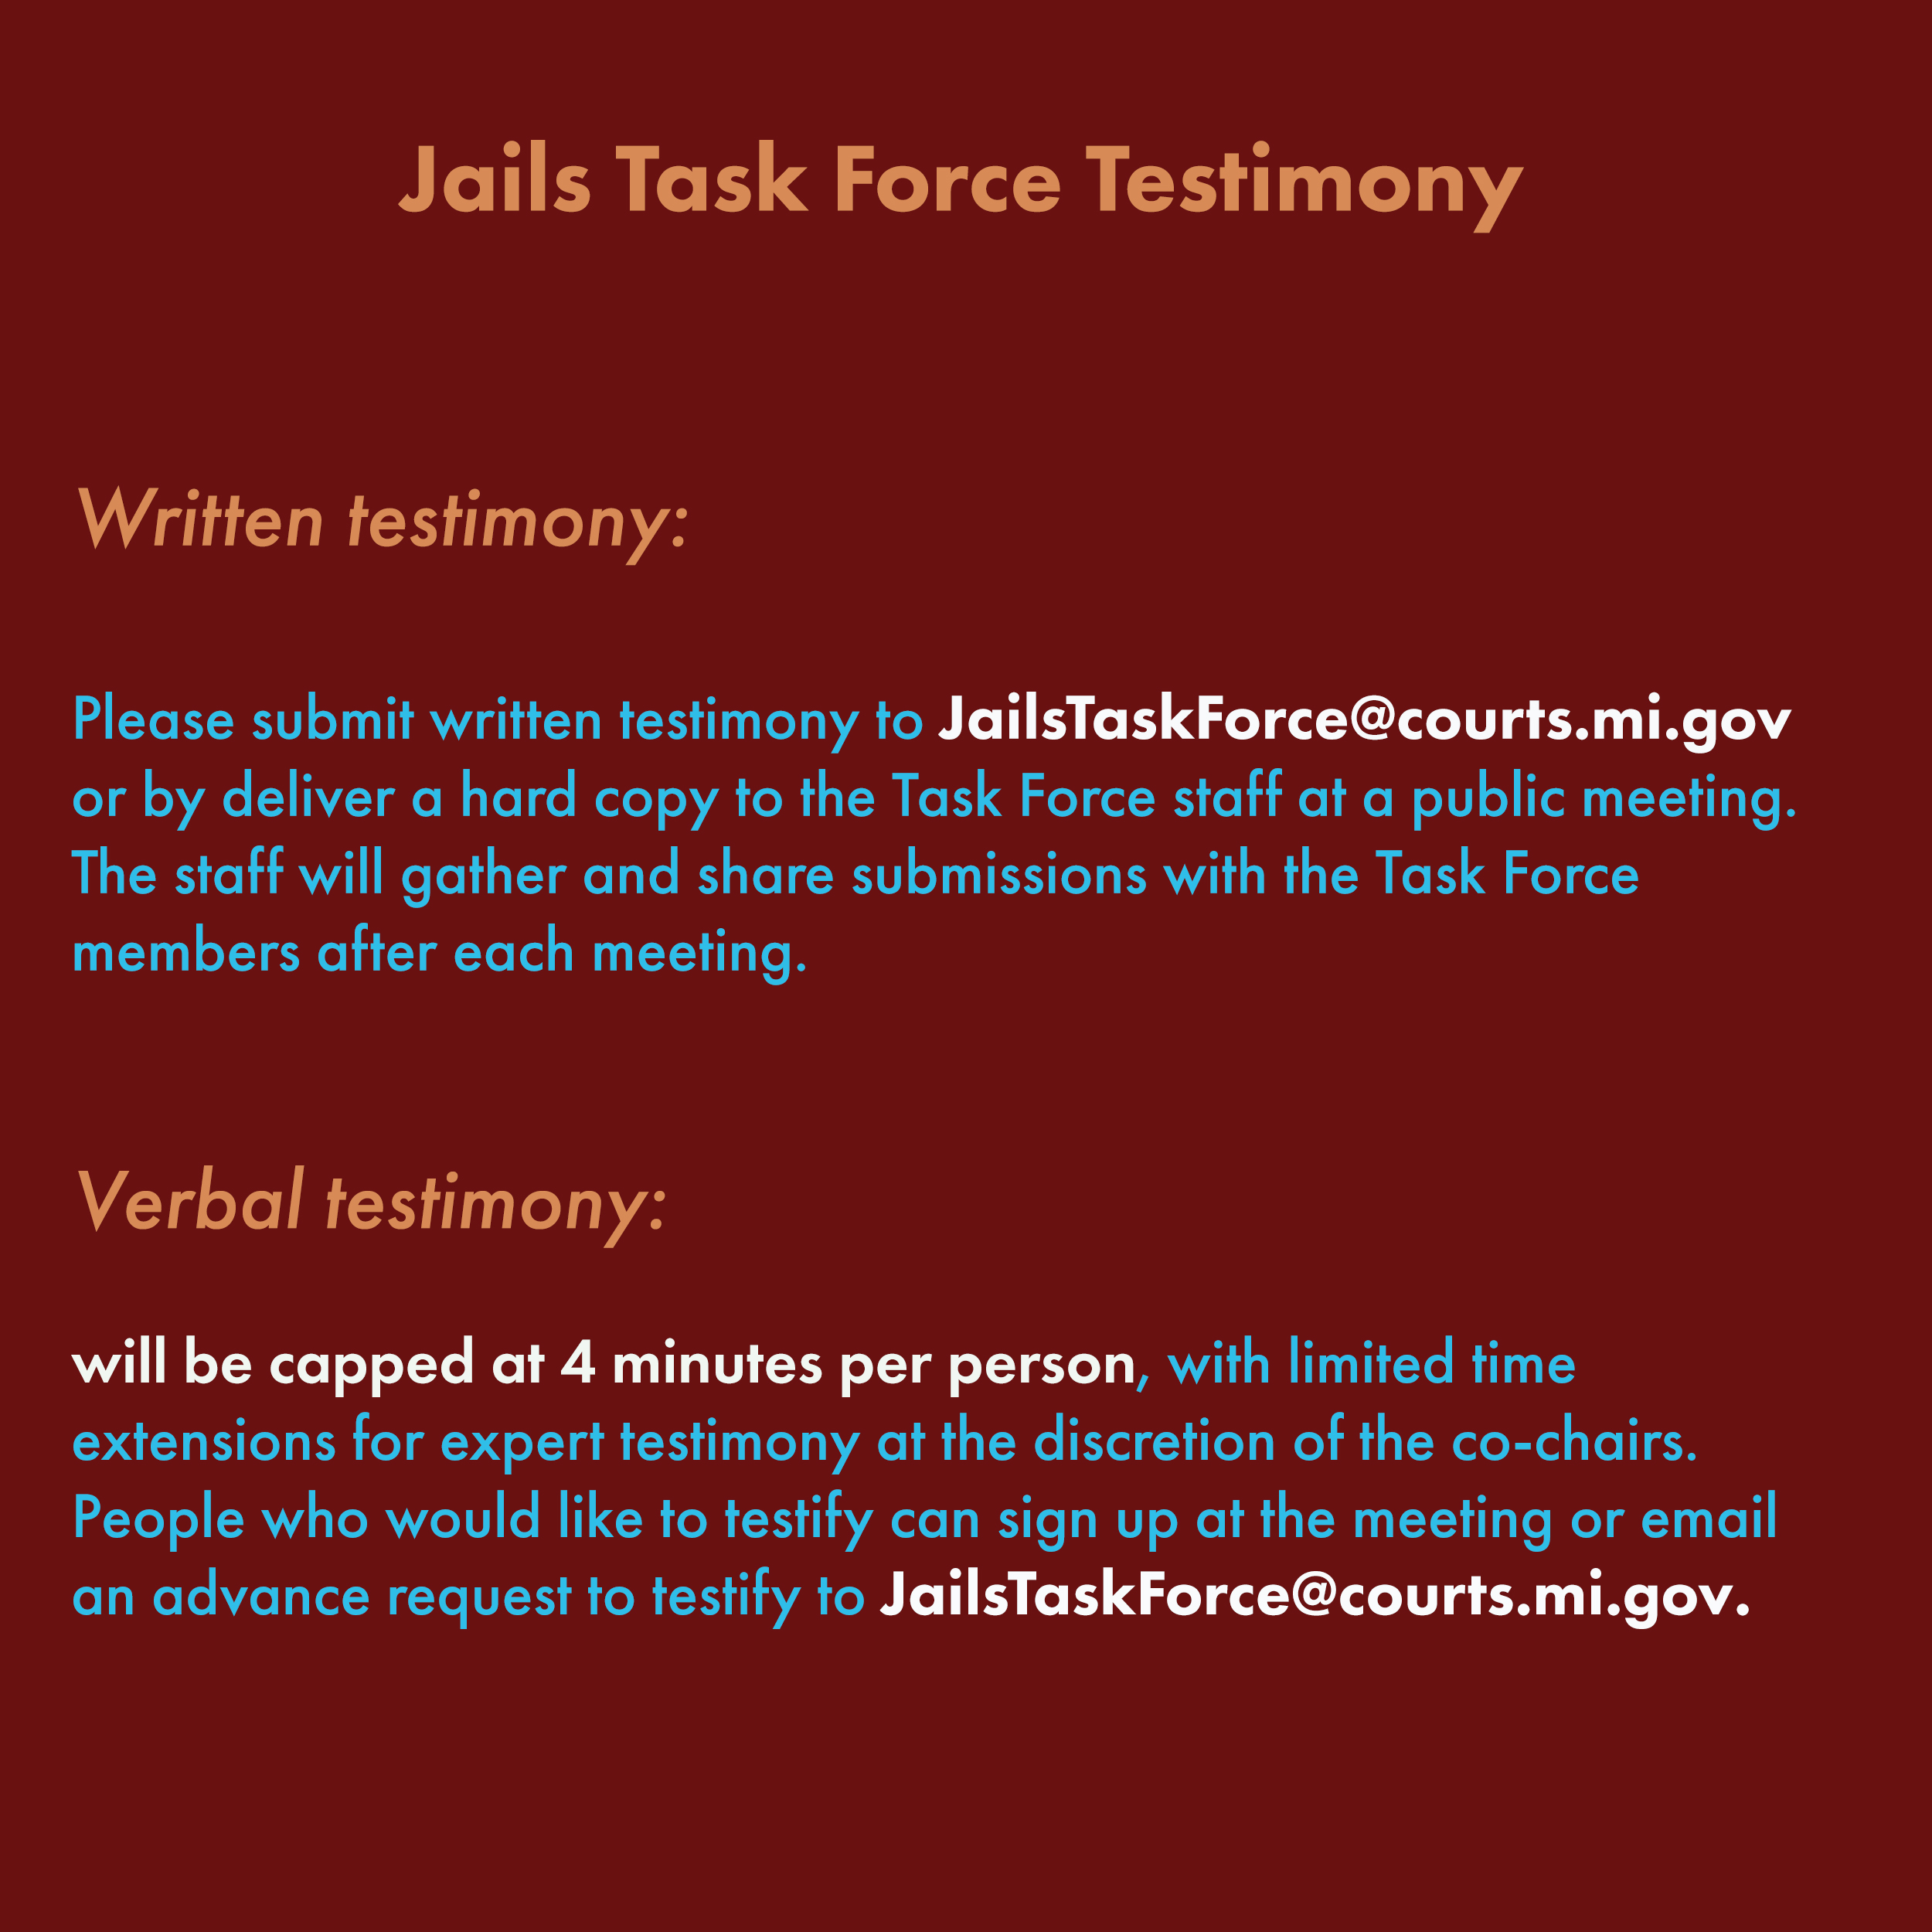 TaskForceTestimony.jpg